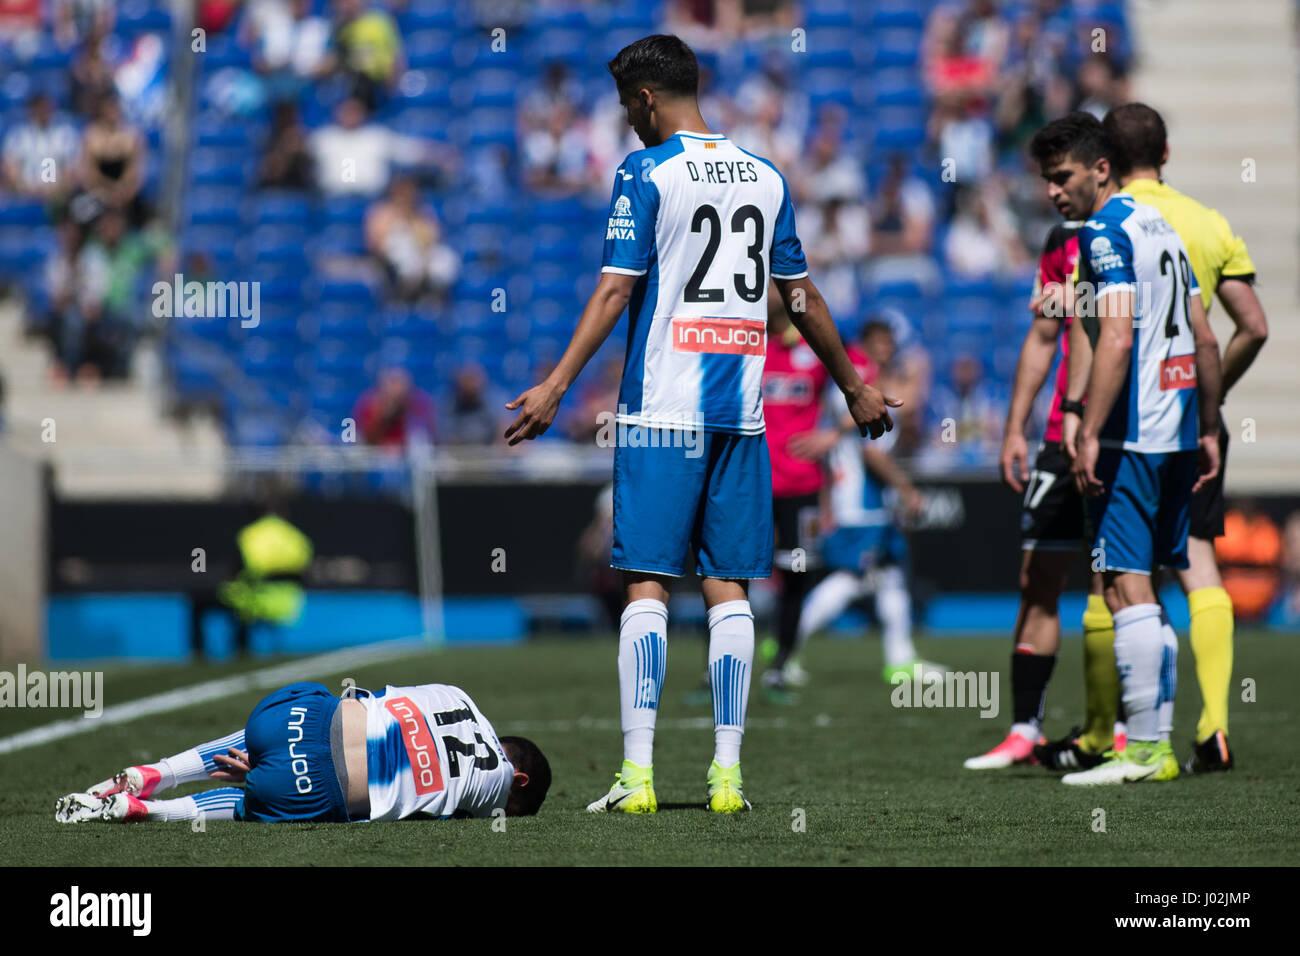 Barcelona, Spain. 8th April, 2017. Diego Reyes laments the injuries of Aaronduring La Liga Santander matchday 31 - Stock Image